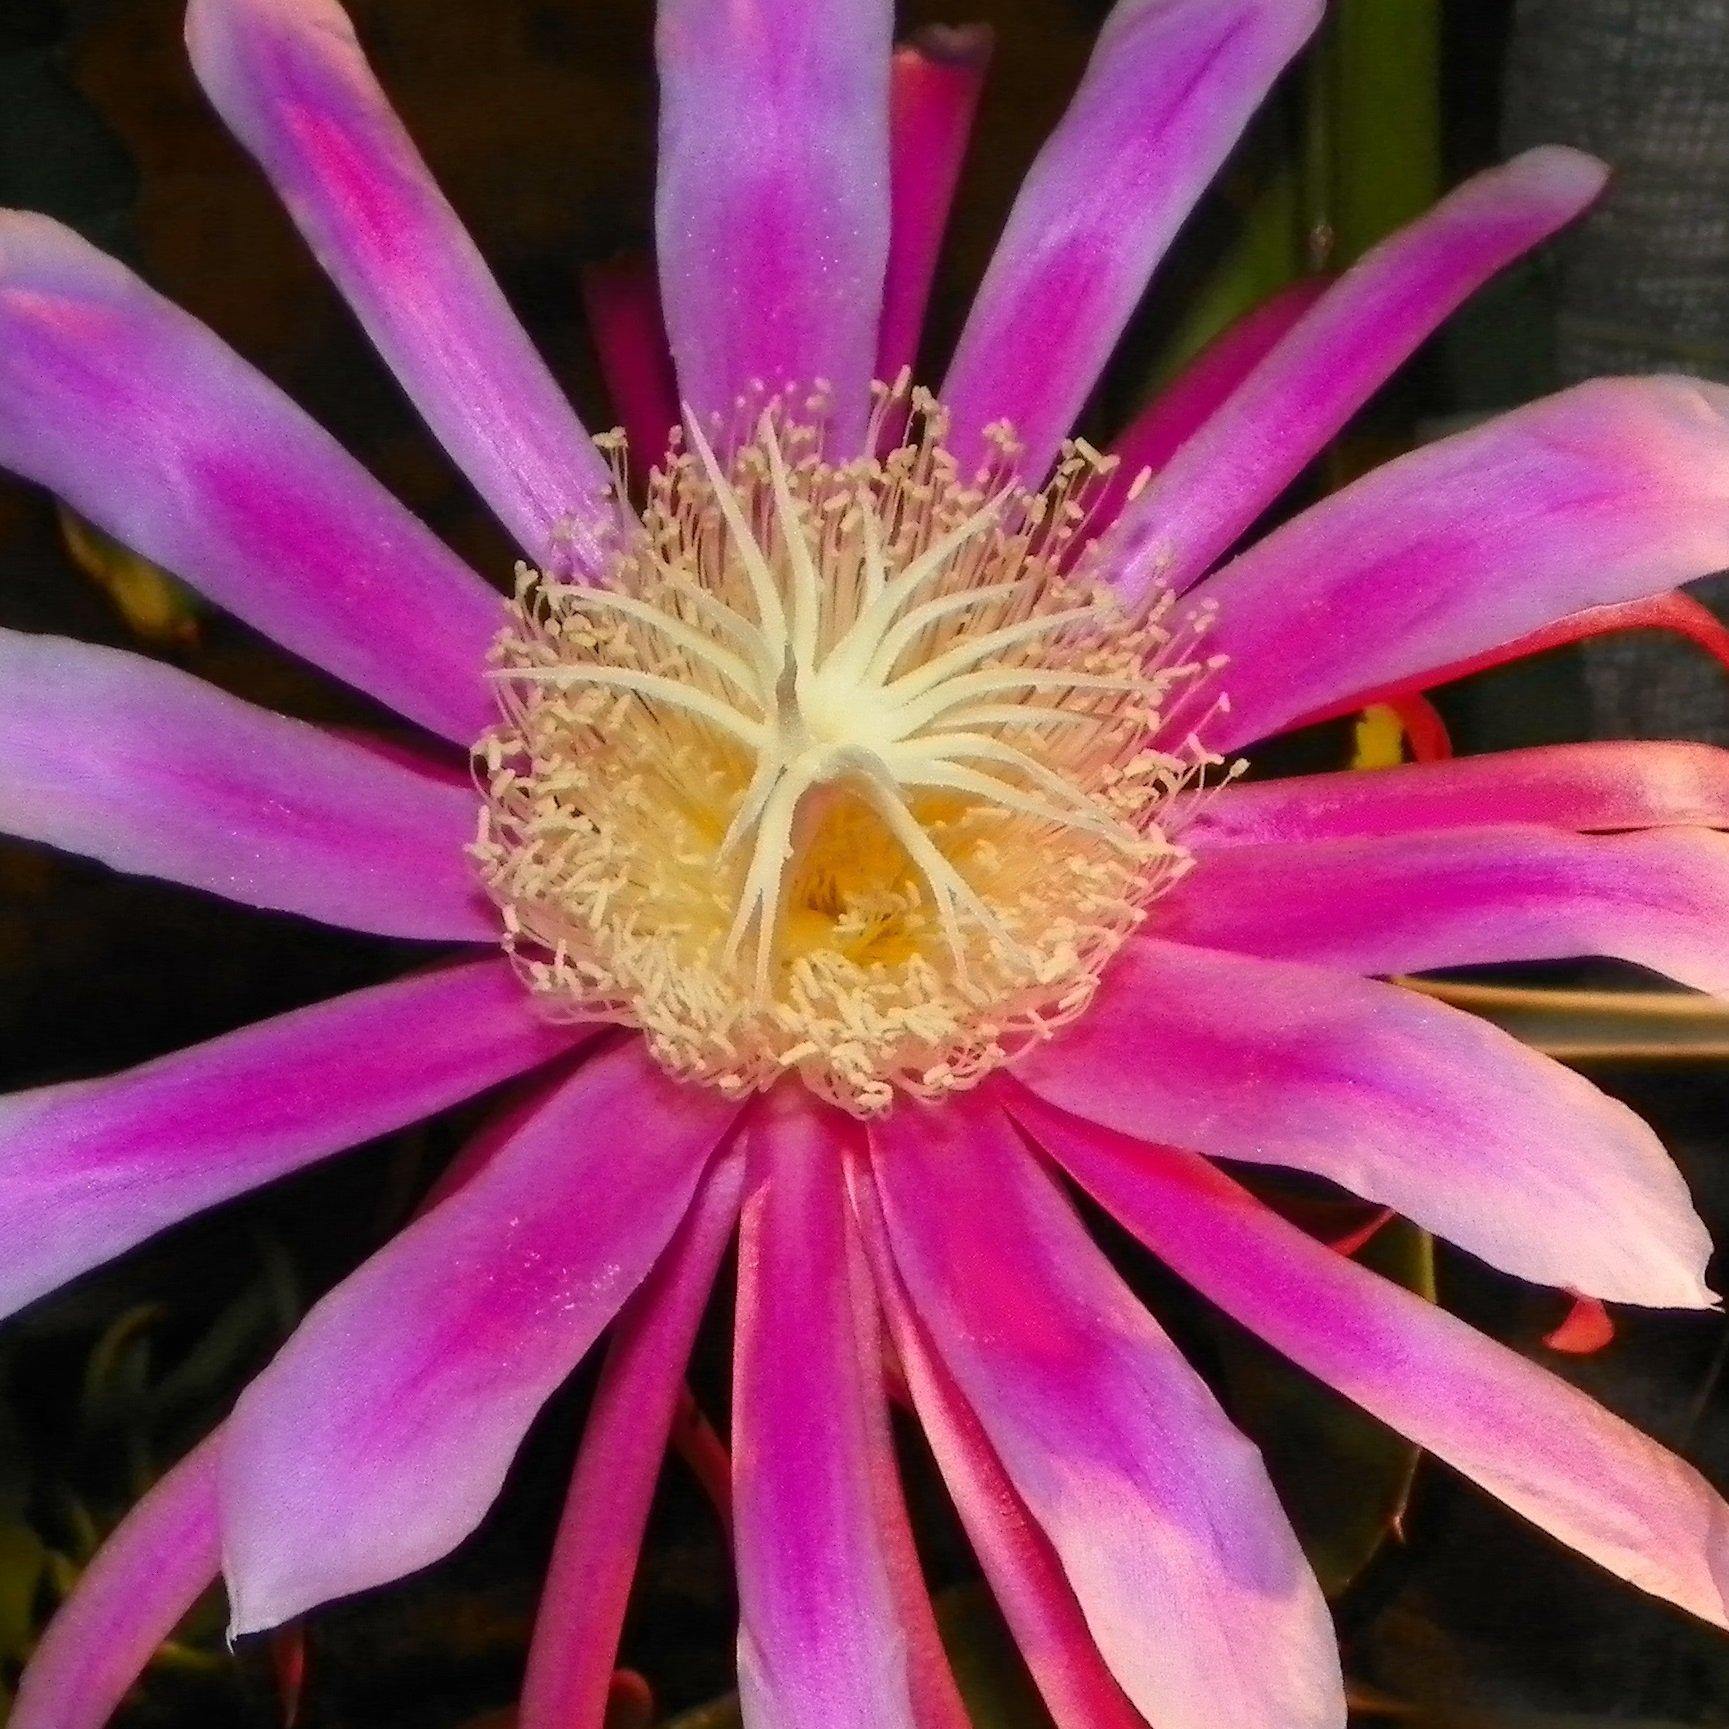 Dragon Fruit variety Kathie Van Arum Flower Stigma